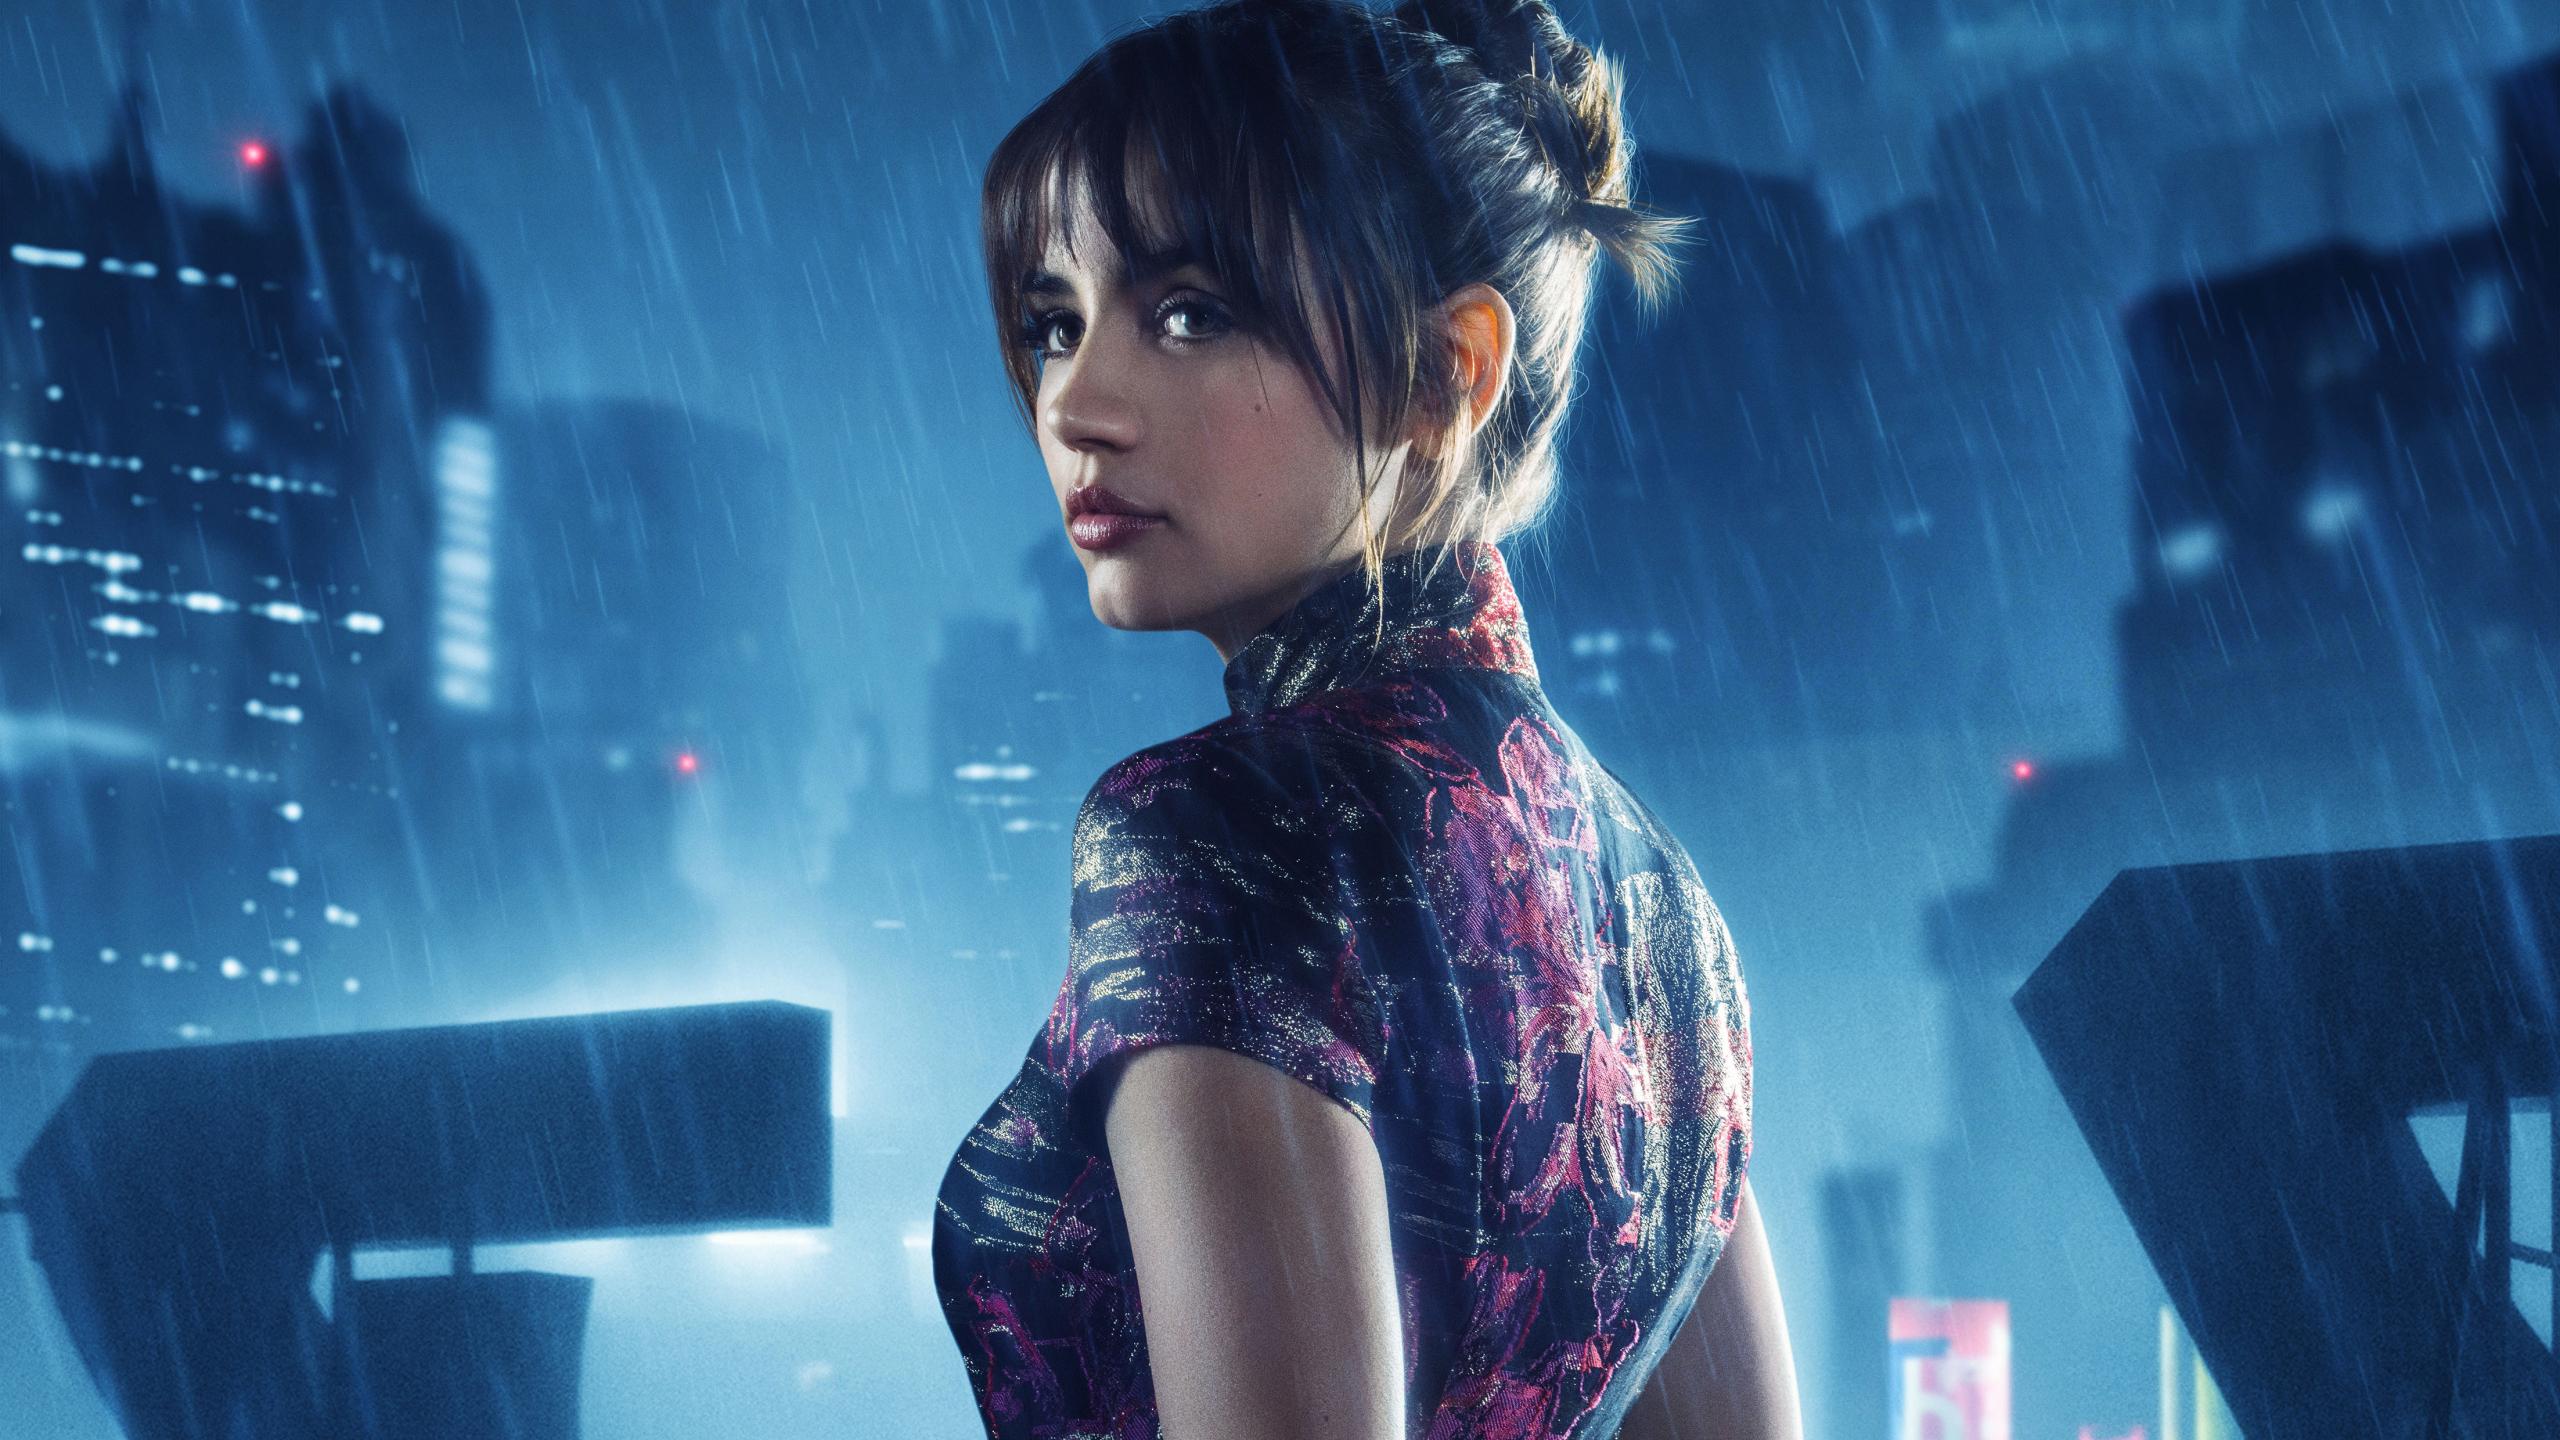 Download 2560x1440 Wallpaper Ana De Armas Joi Blade Runner 2049 Actress Movie Dual Wide Widescreen 16 9 Widescreen 2560x1440 Hd Image Background 467